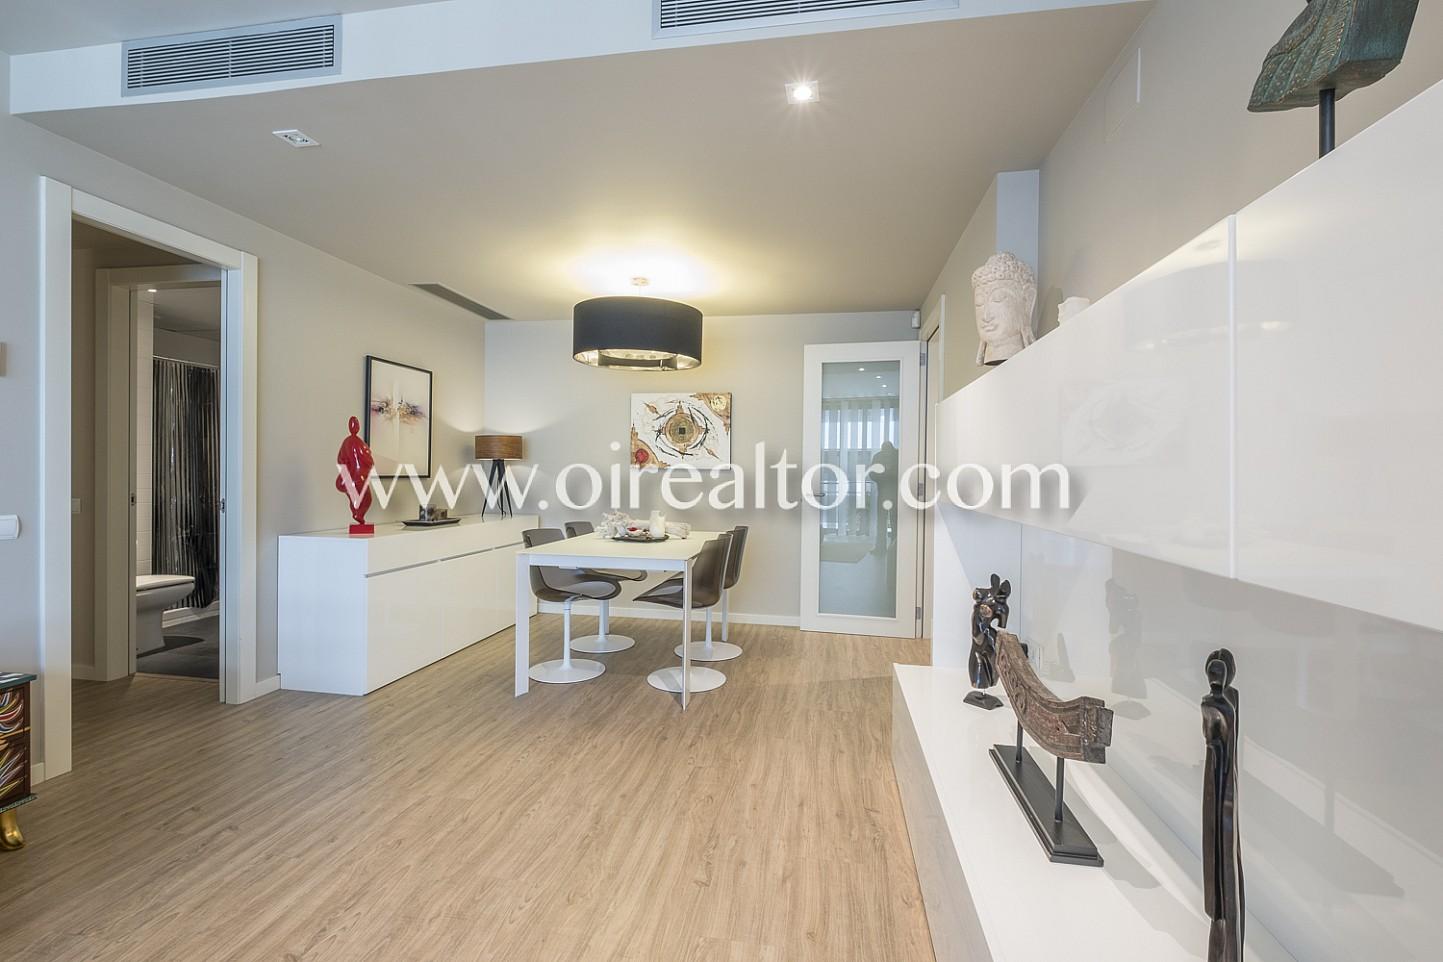 Salón comedor, luminoso, amplio, diáfano, salón, comedor, cocina, salón comedor de diseño, piso de diseño